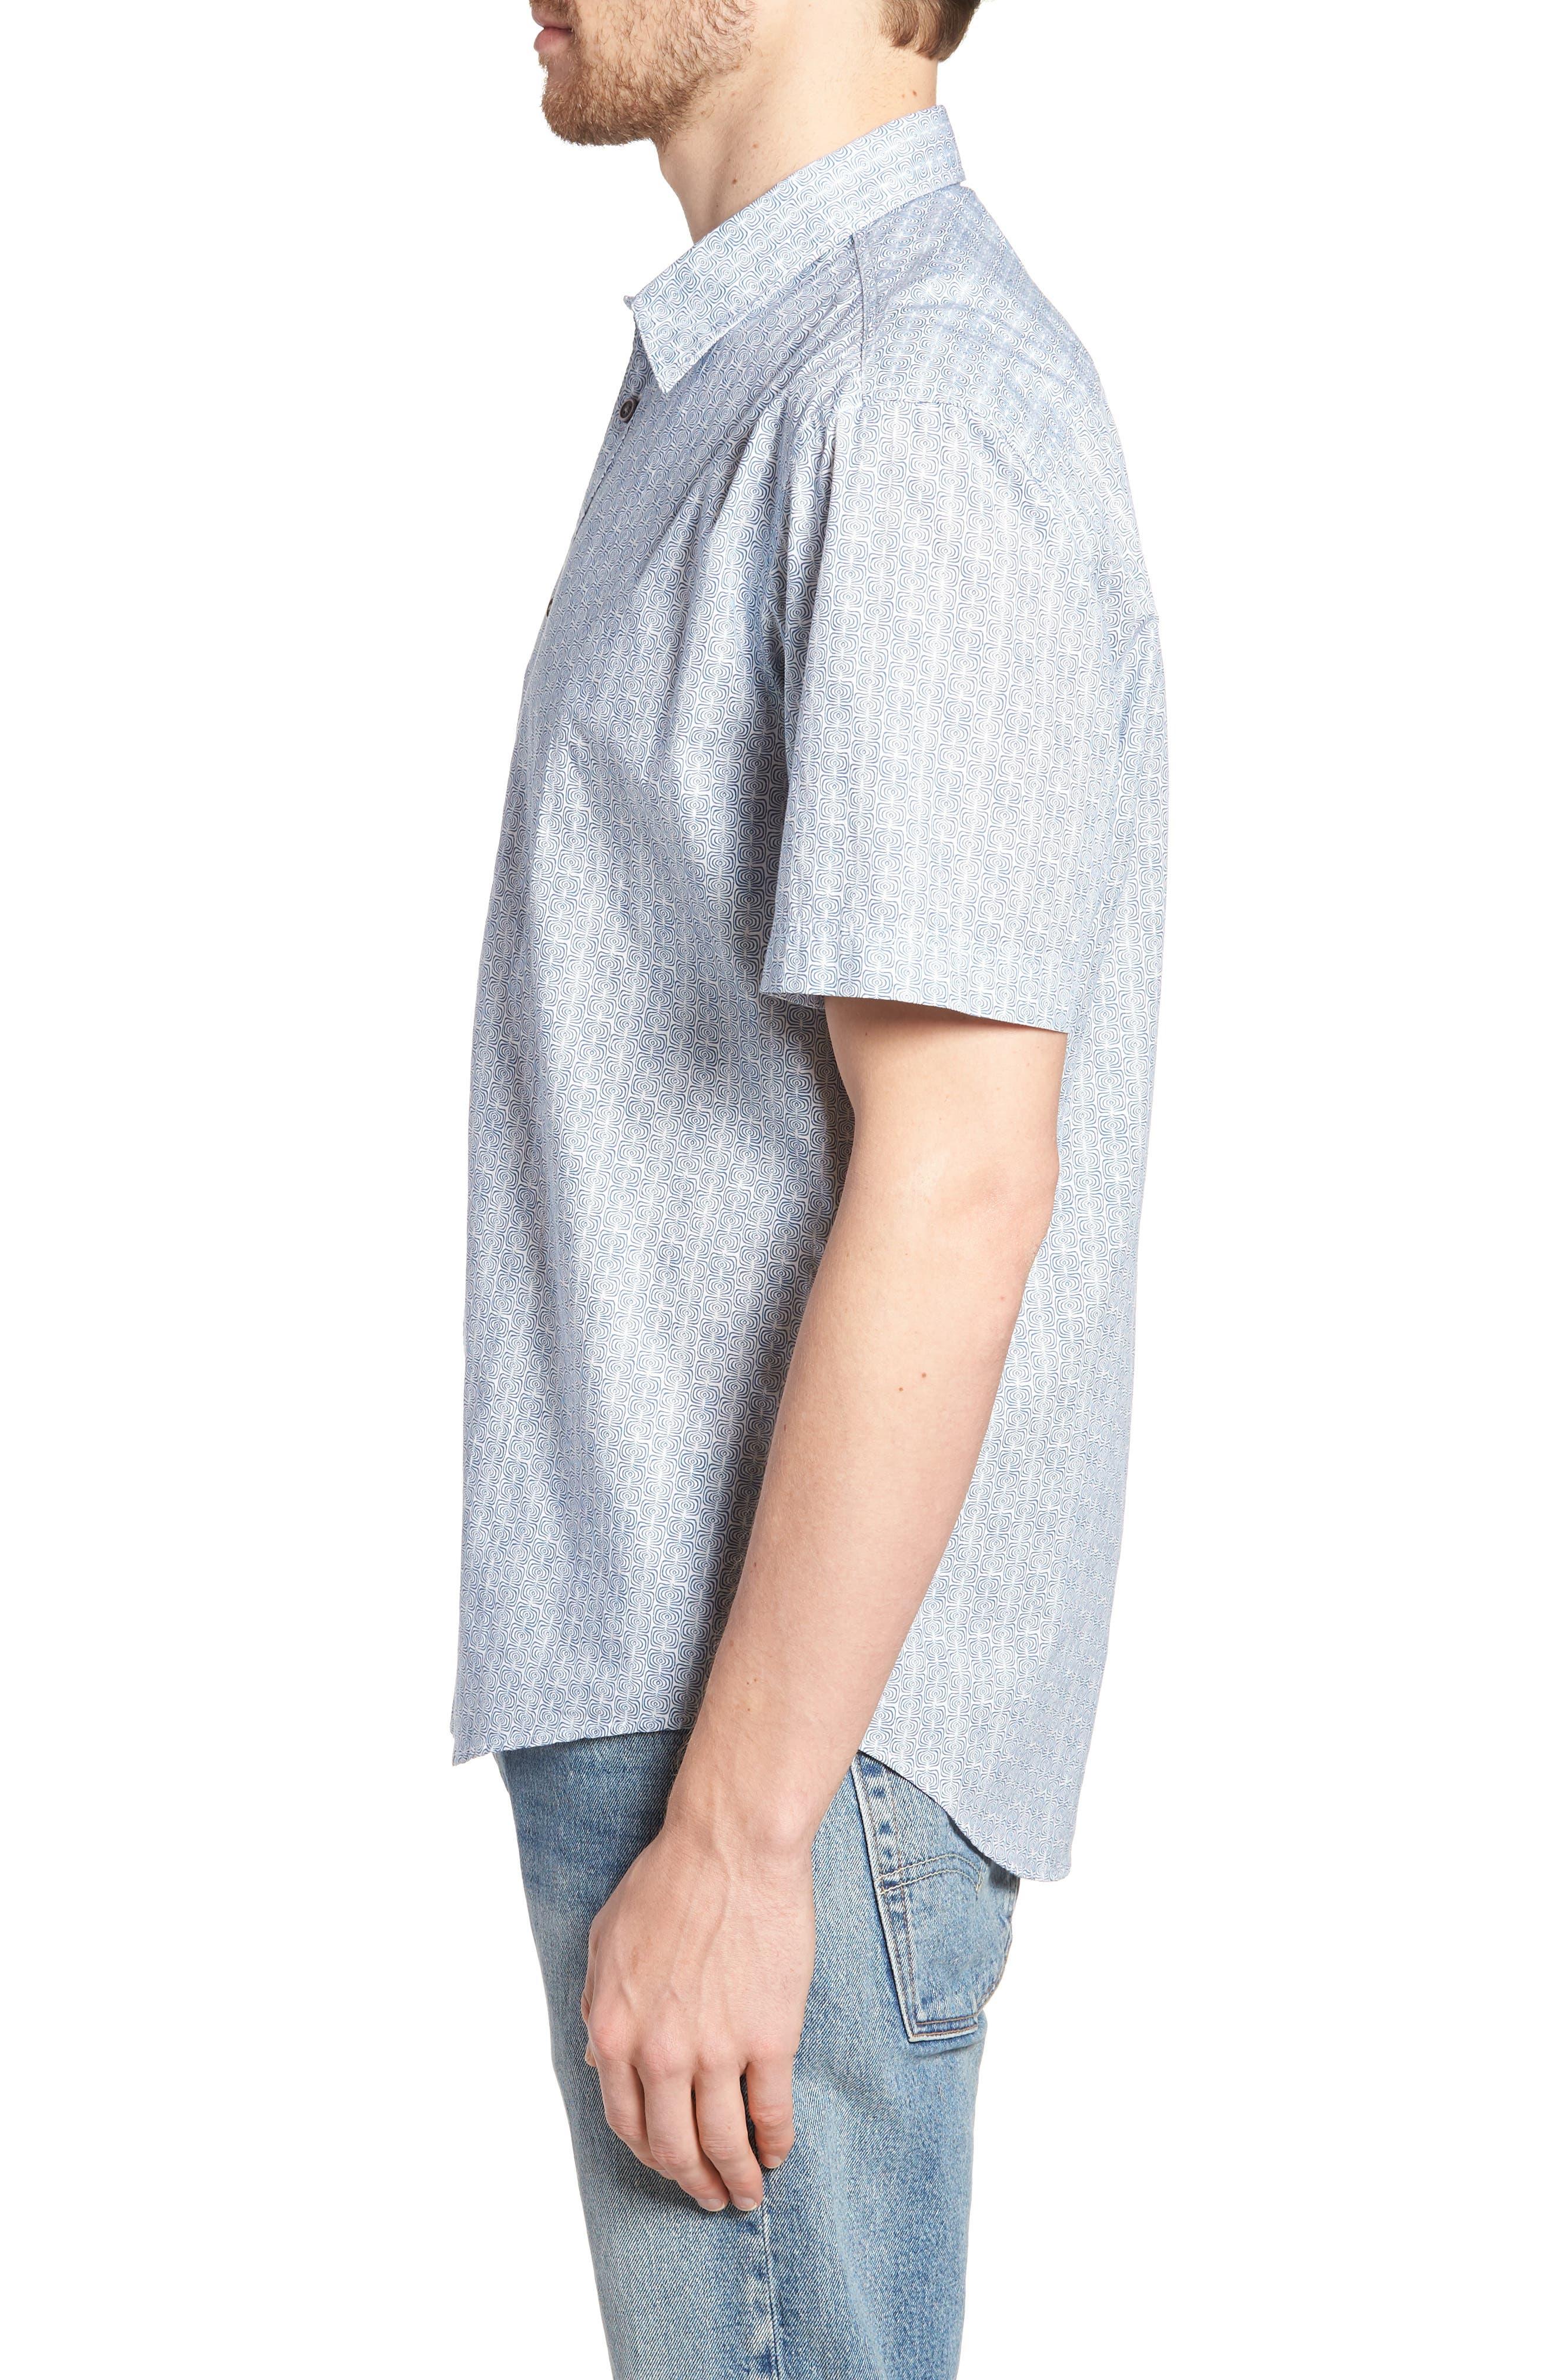 Jacurre Regular Fit Short Sleeve Sport Shirt,                             Alternate thumbnail 3, color,                             462